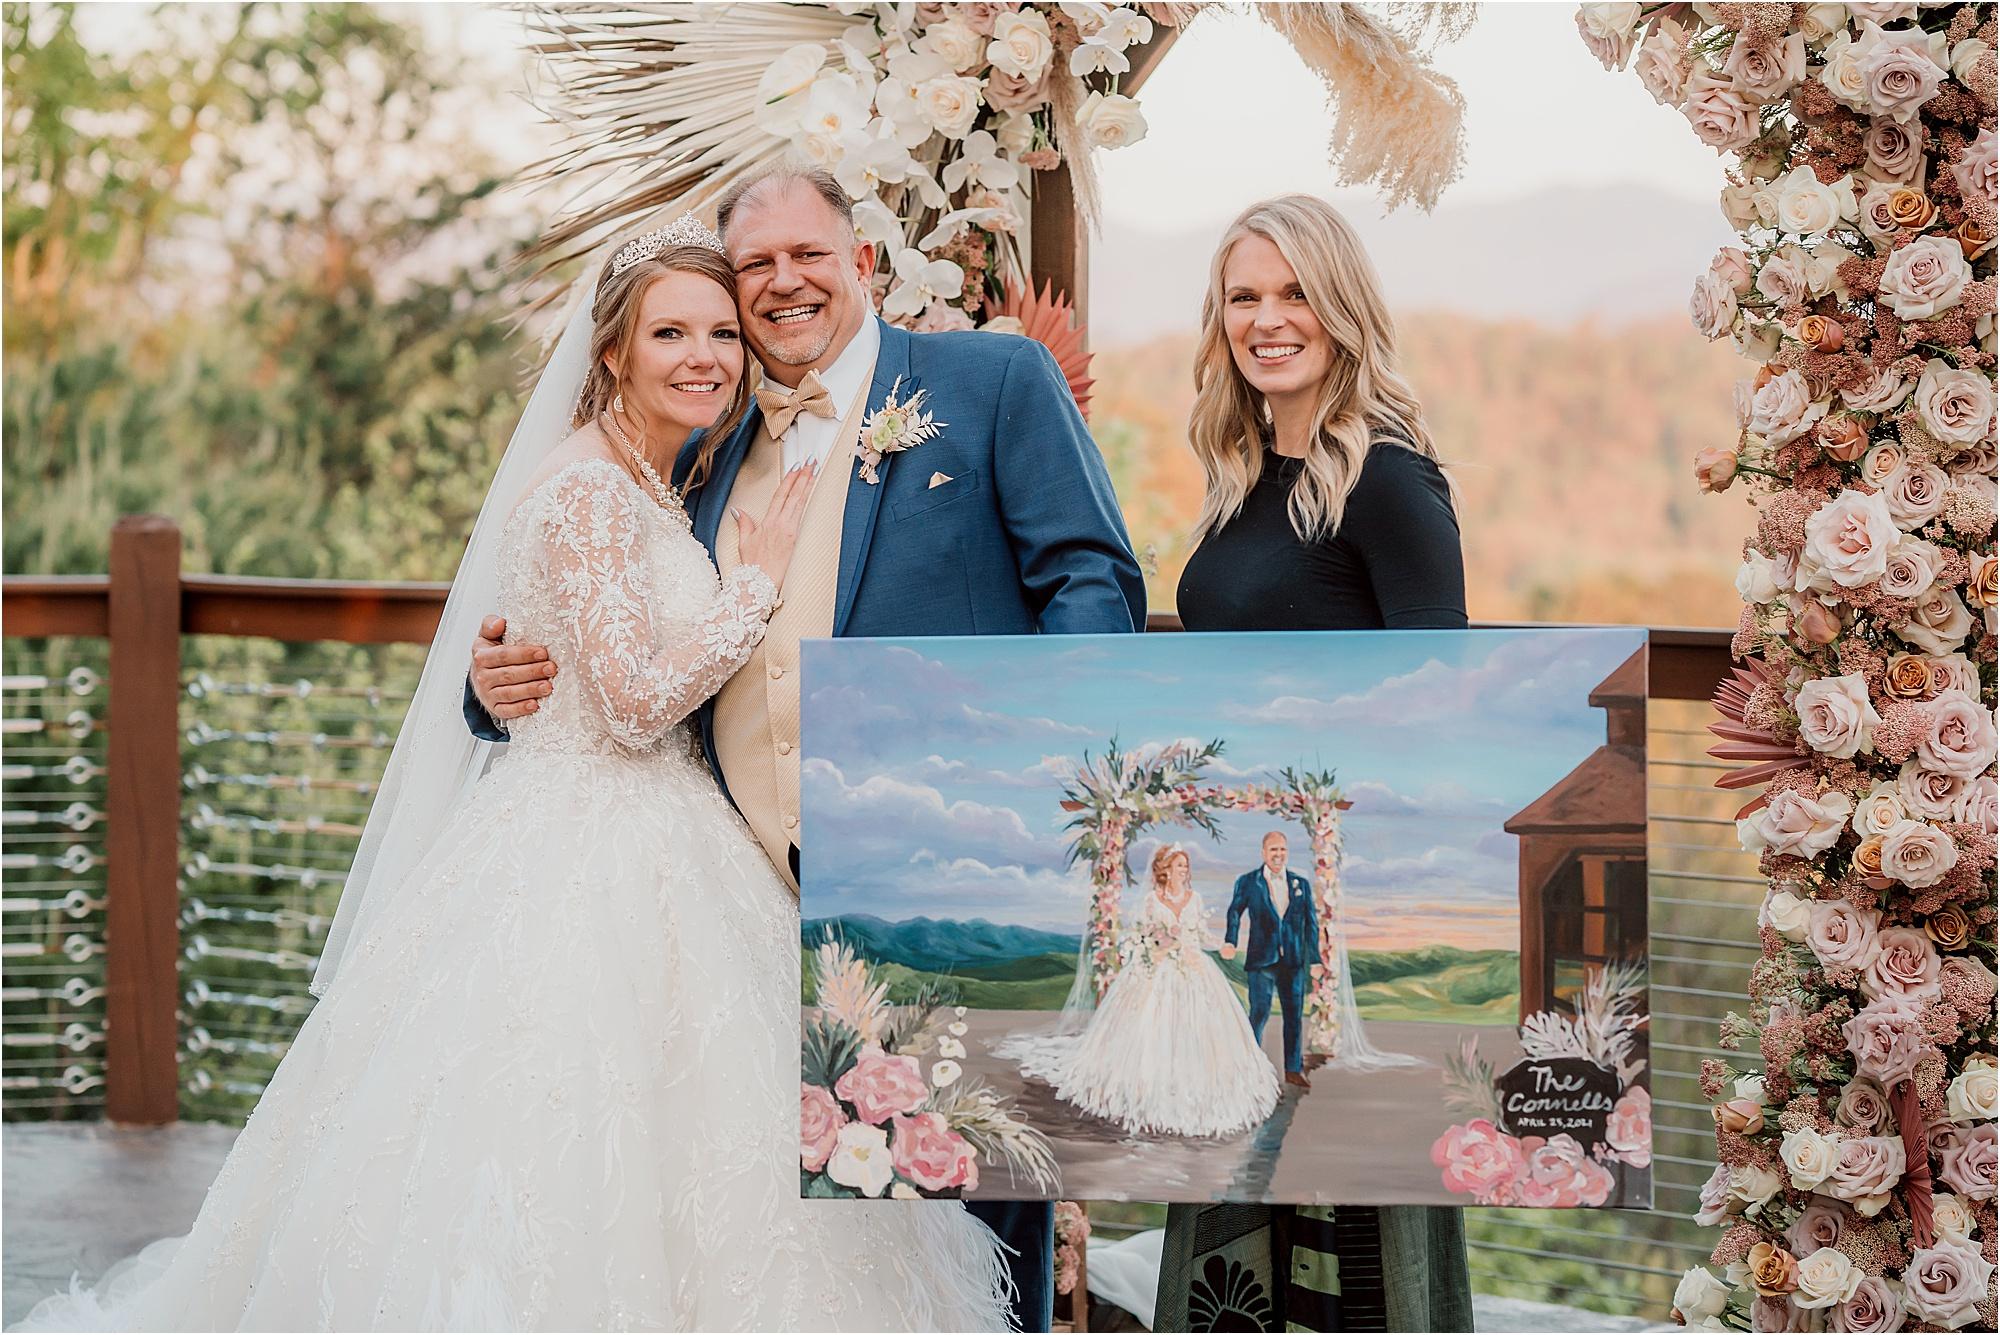 custom live painting at wedding